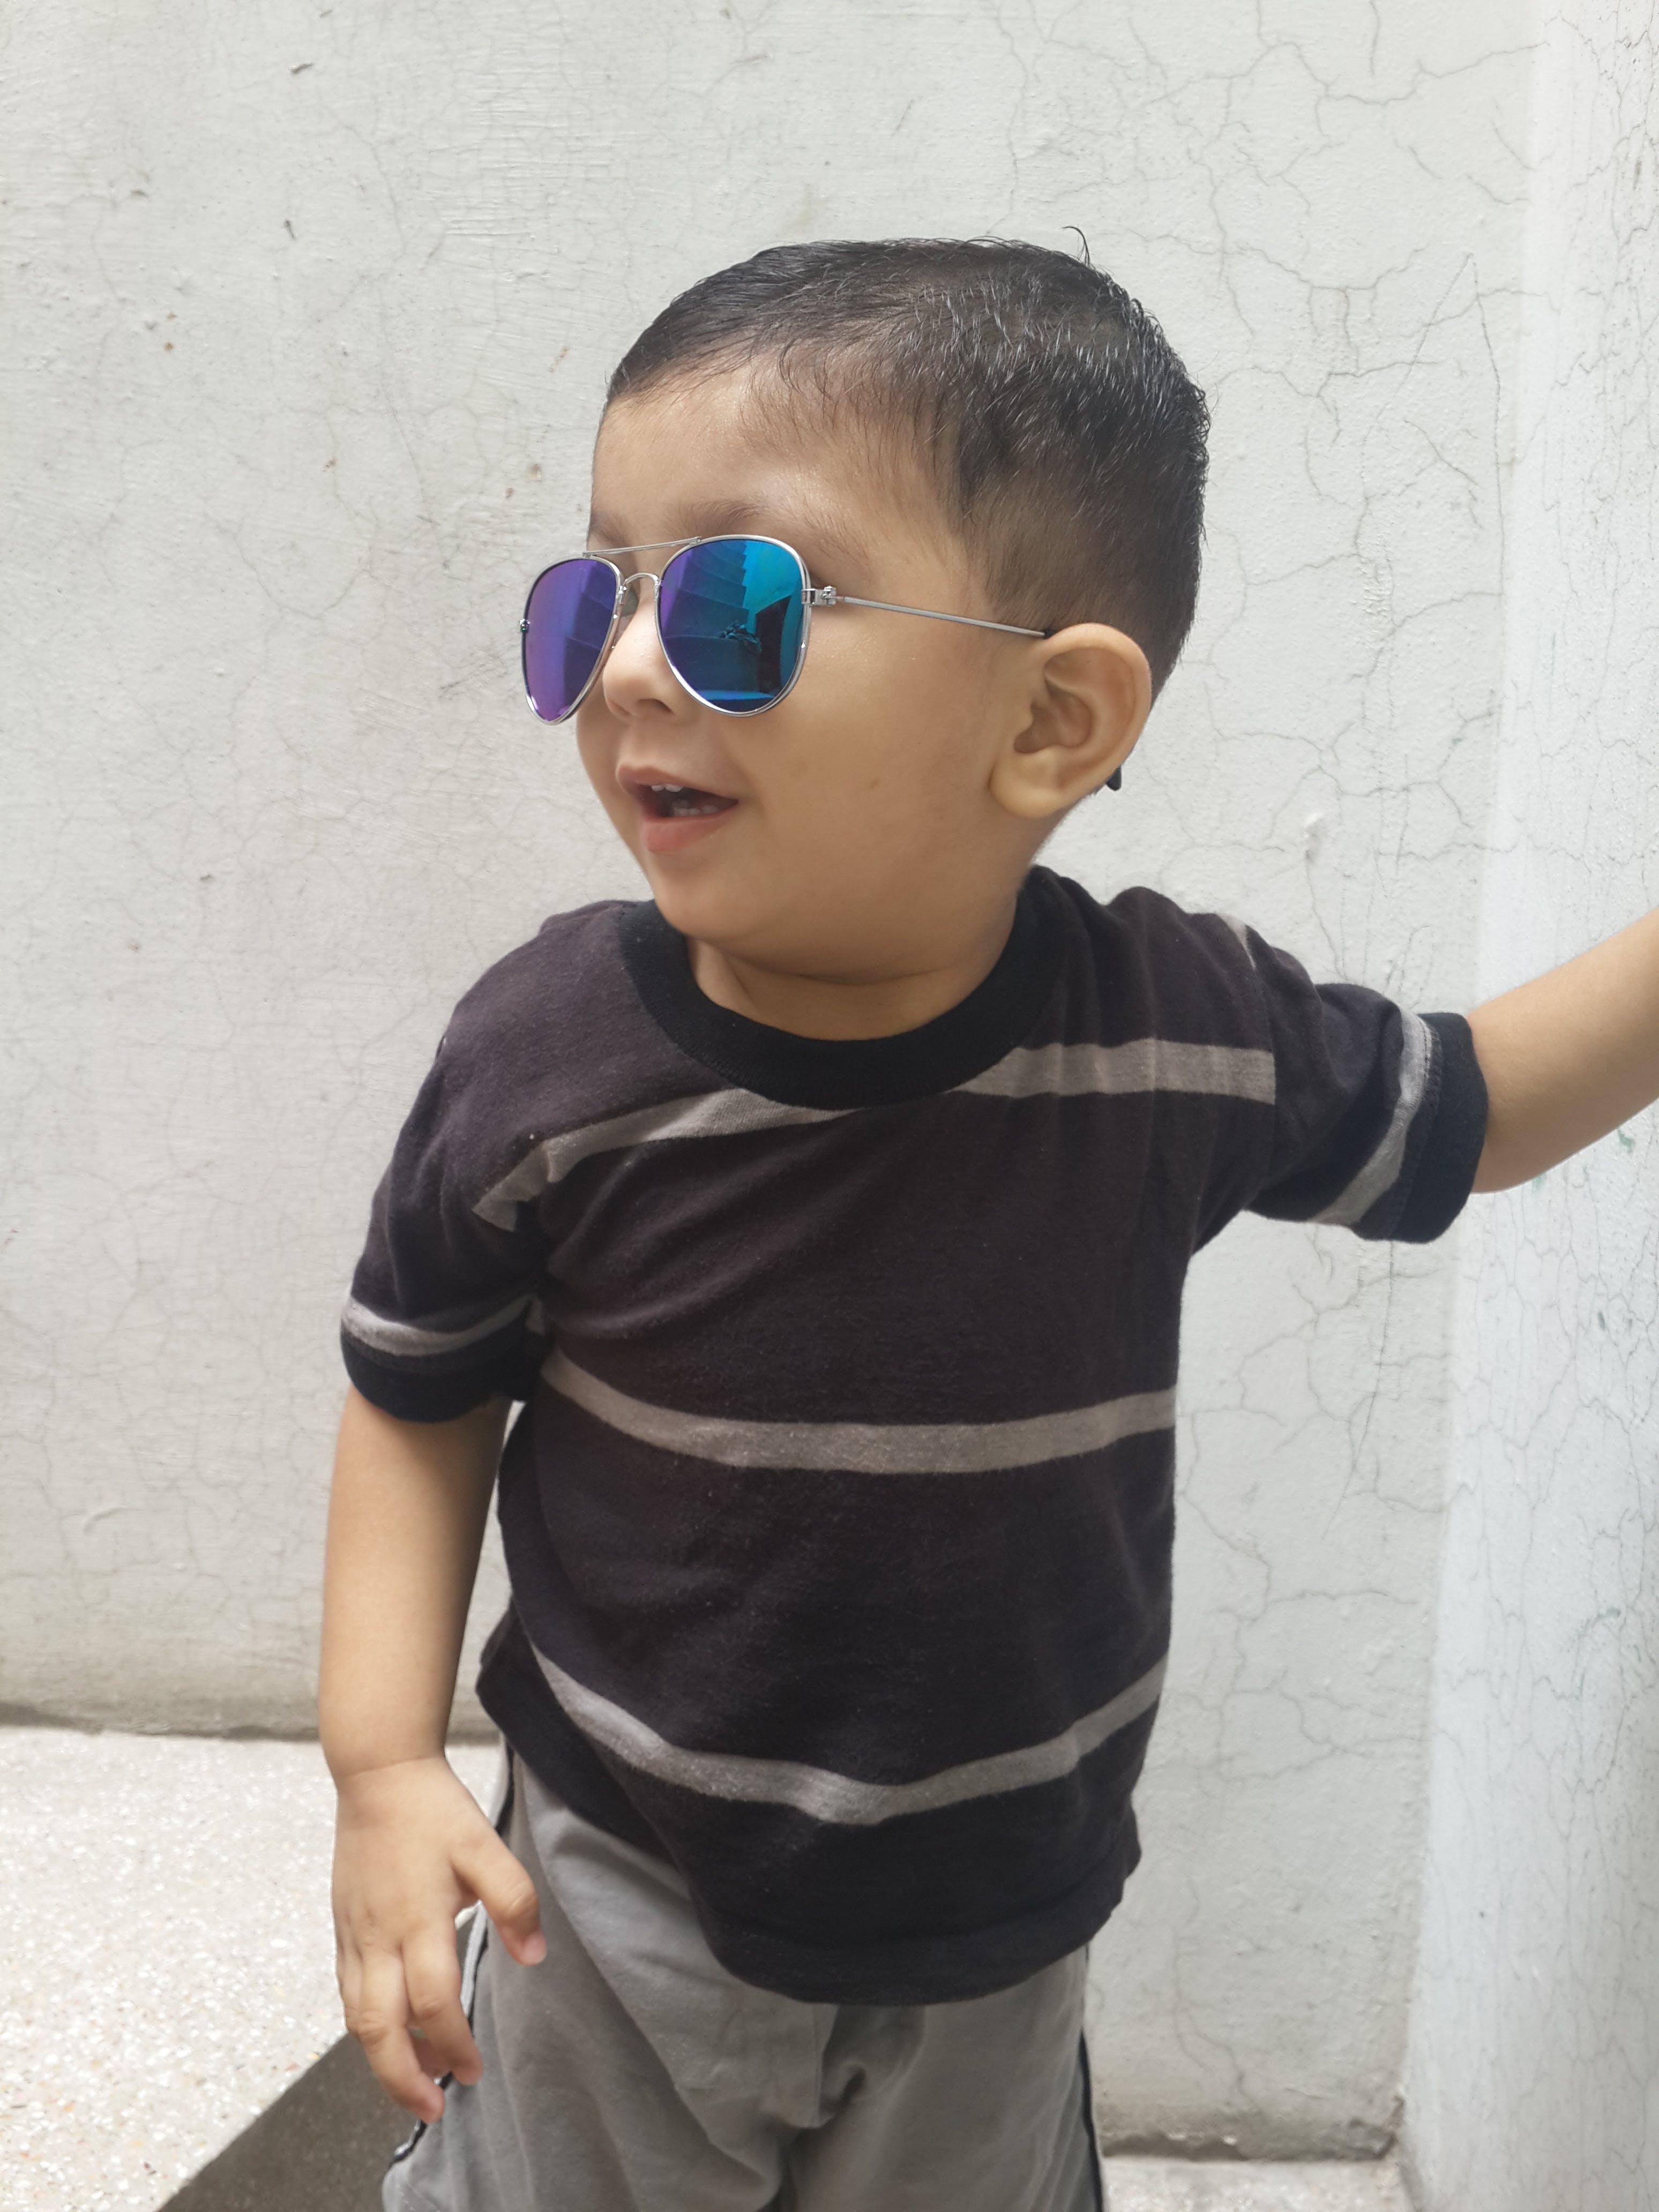 Free stock photo of Mahad, Samsong glaxy s4, sun glasses